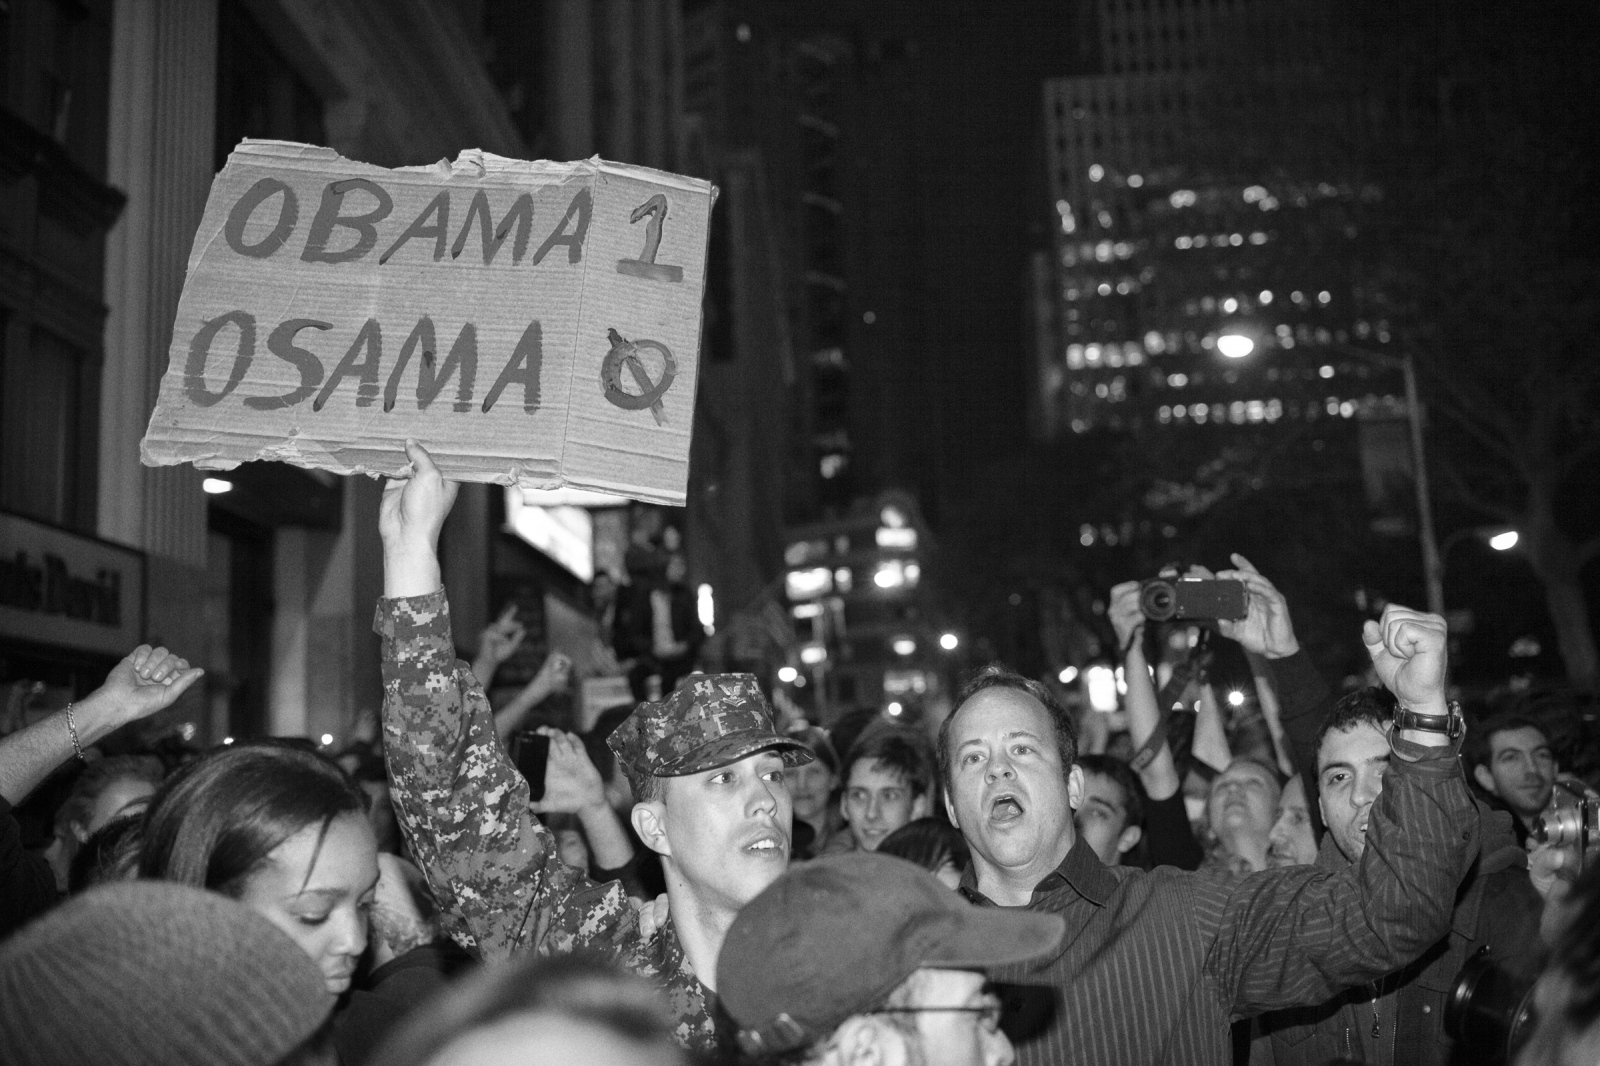 Art and Documentary Photography - Loading Obama_Got_Osama_LoRes_B_W07.jpg